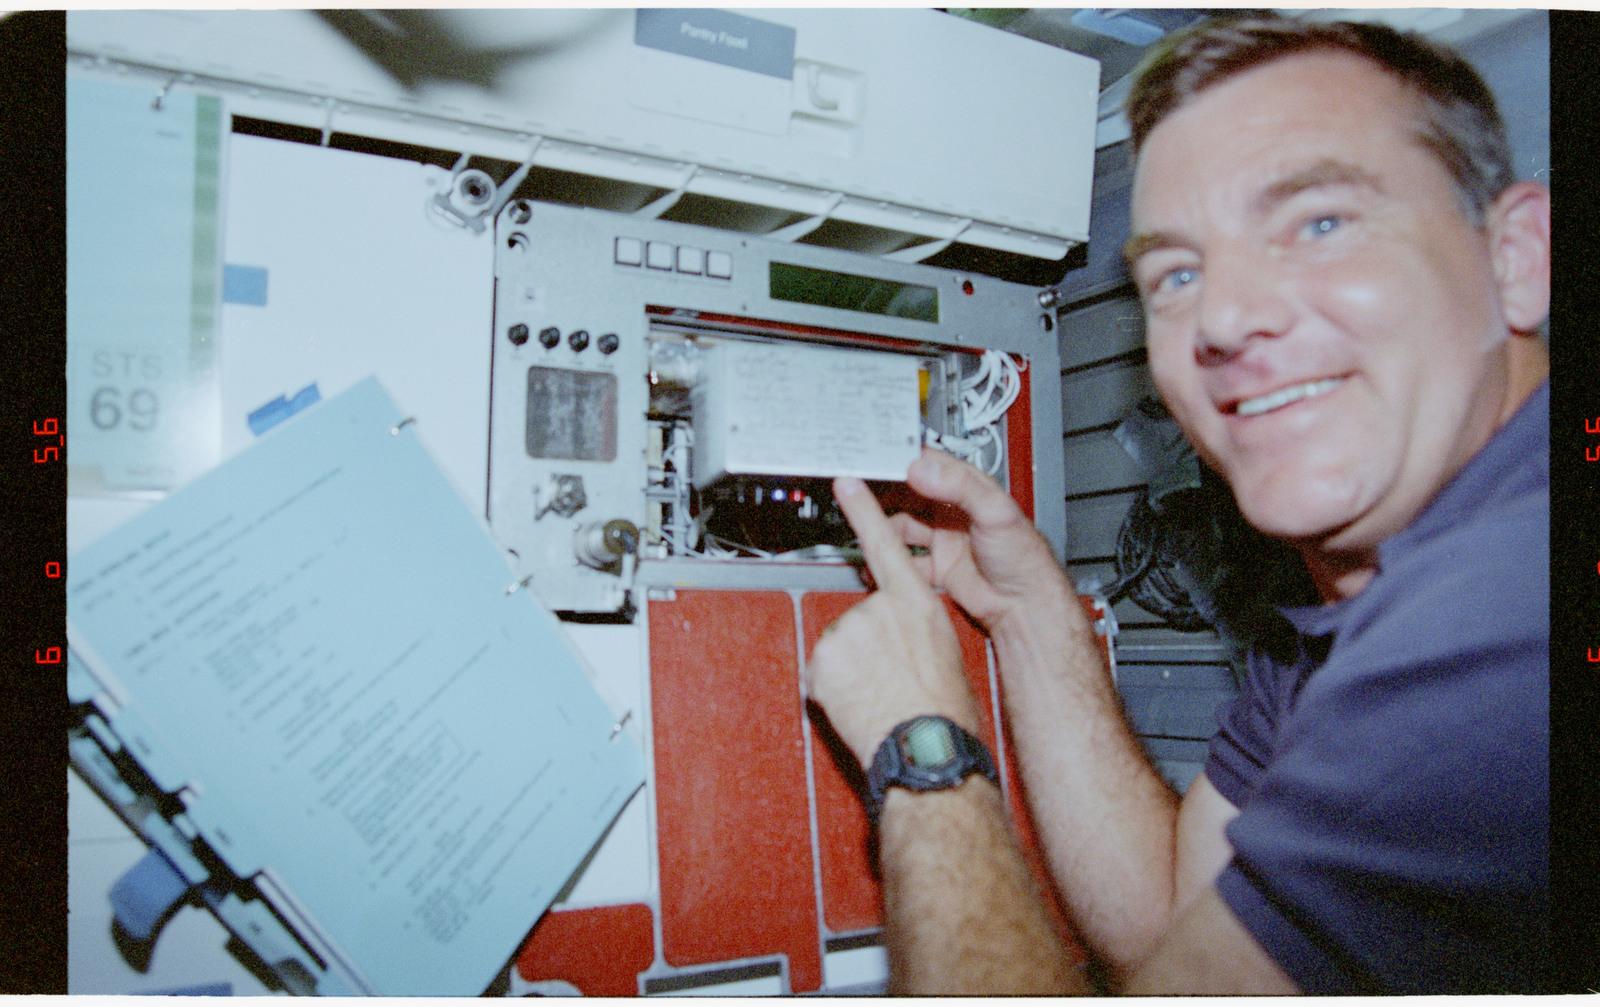 STS069-301-015 - STS-069 - CMIX-04